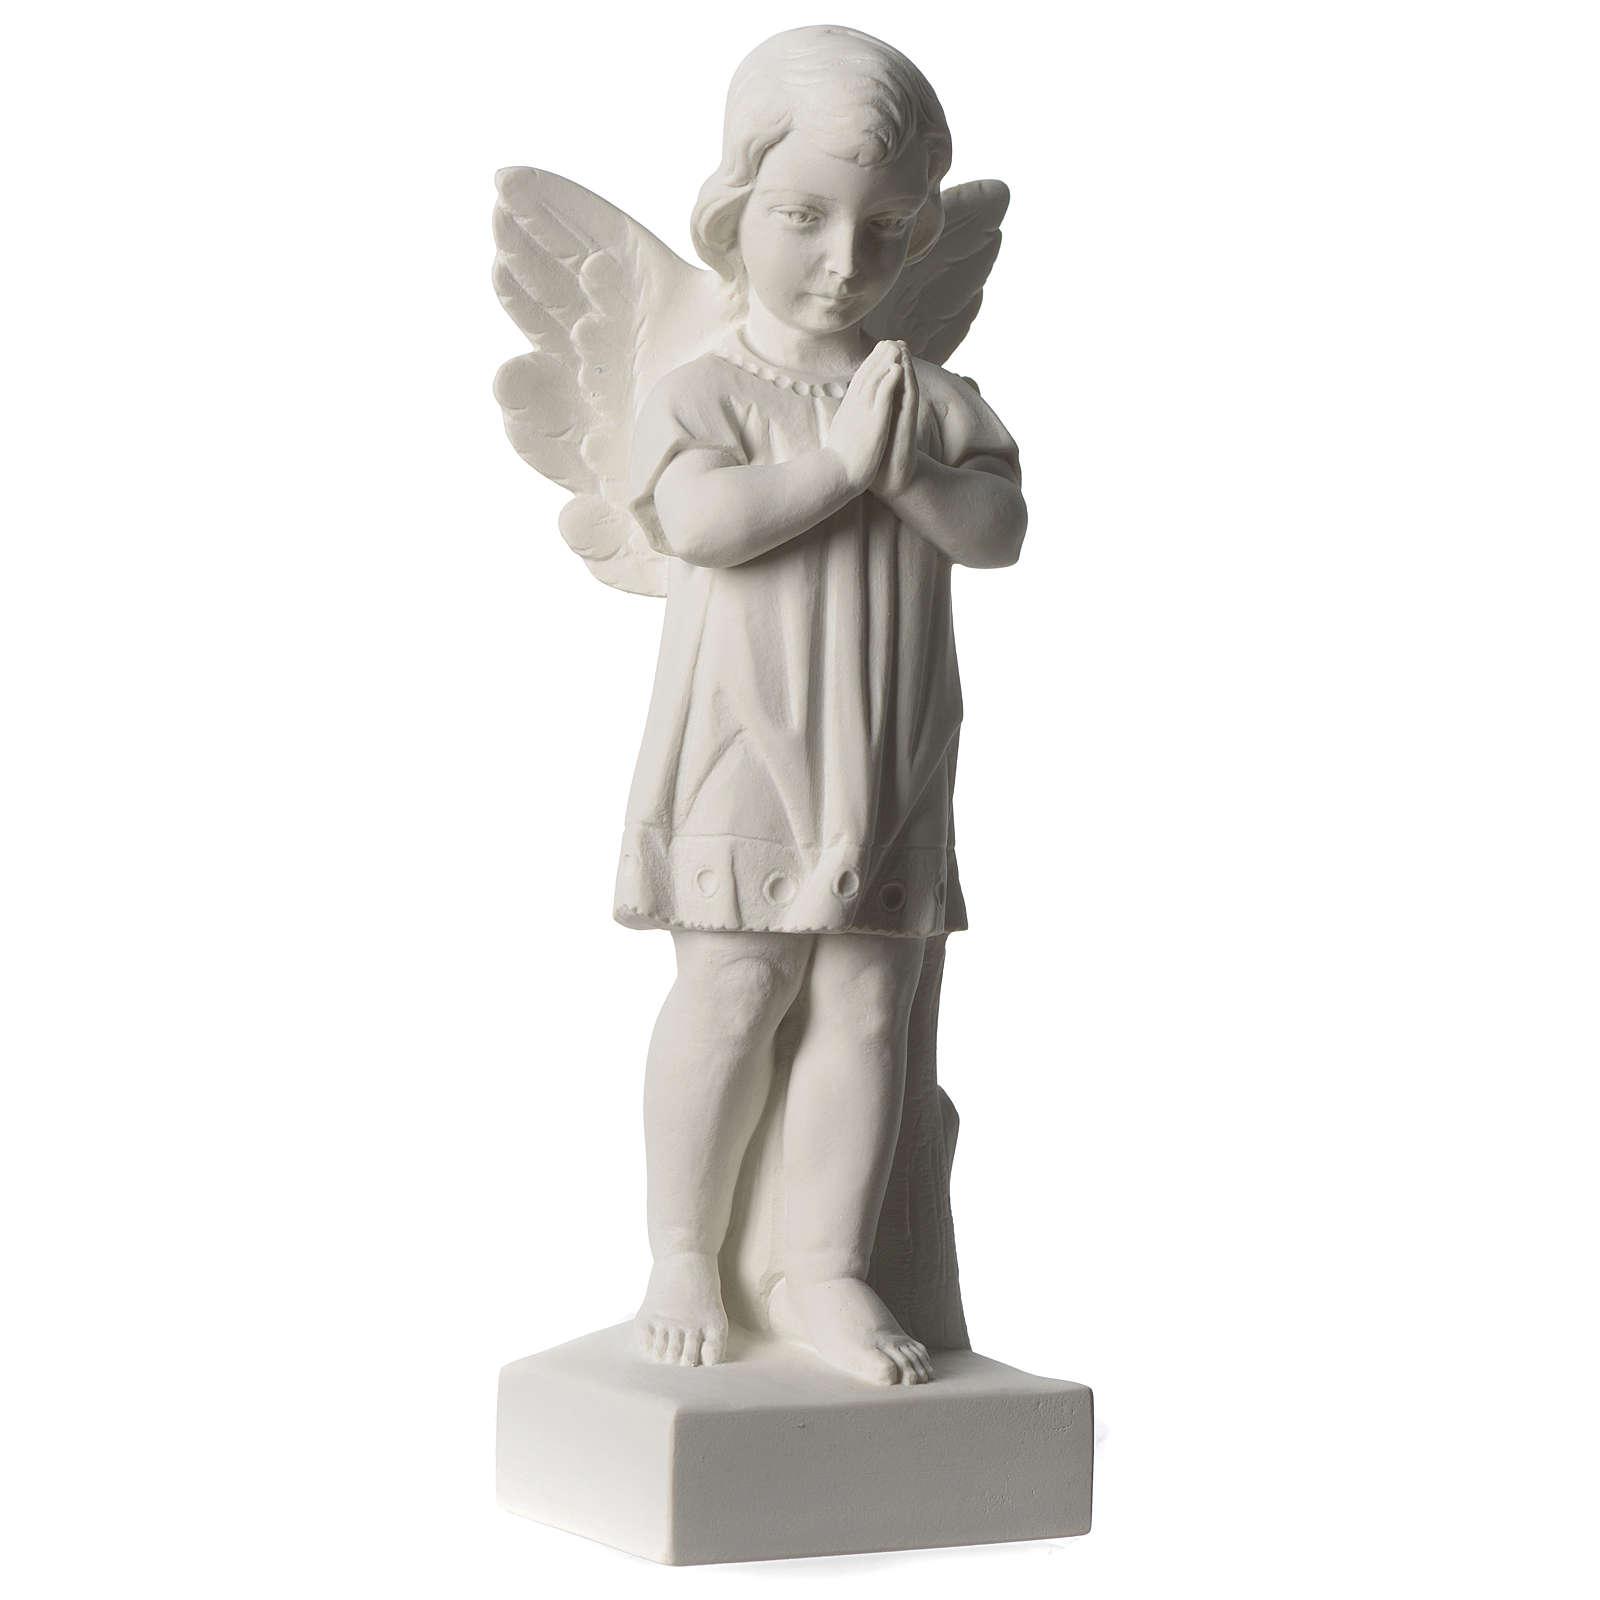 Angelo mani giunte marmo sintetico bianco Carrara 25 - 30 cm 4